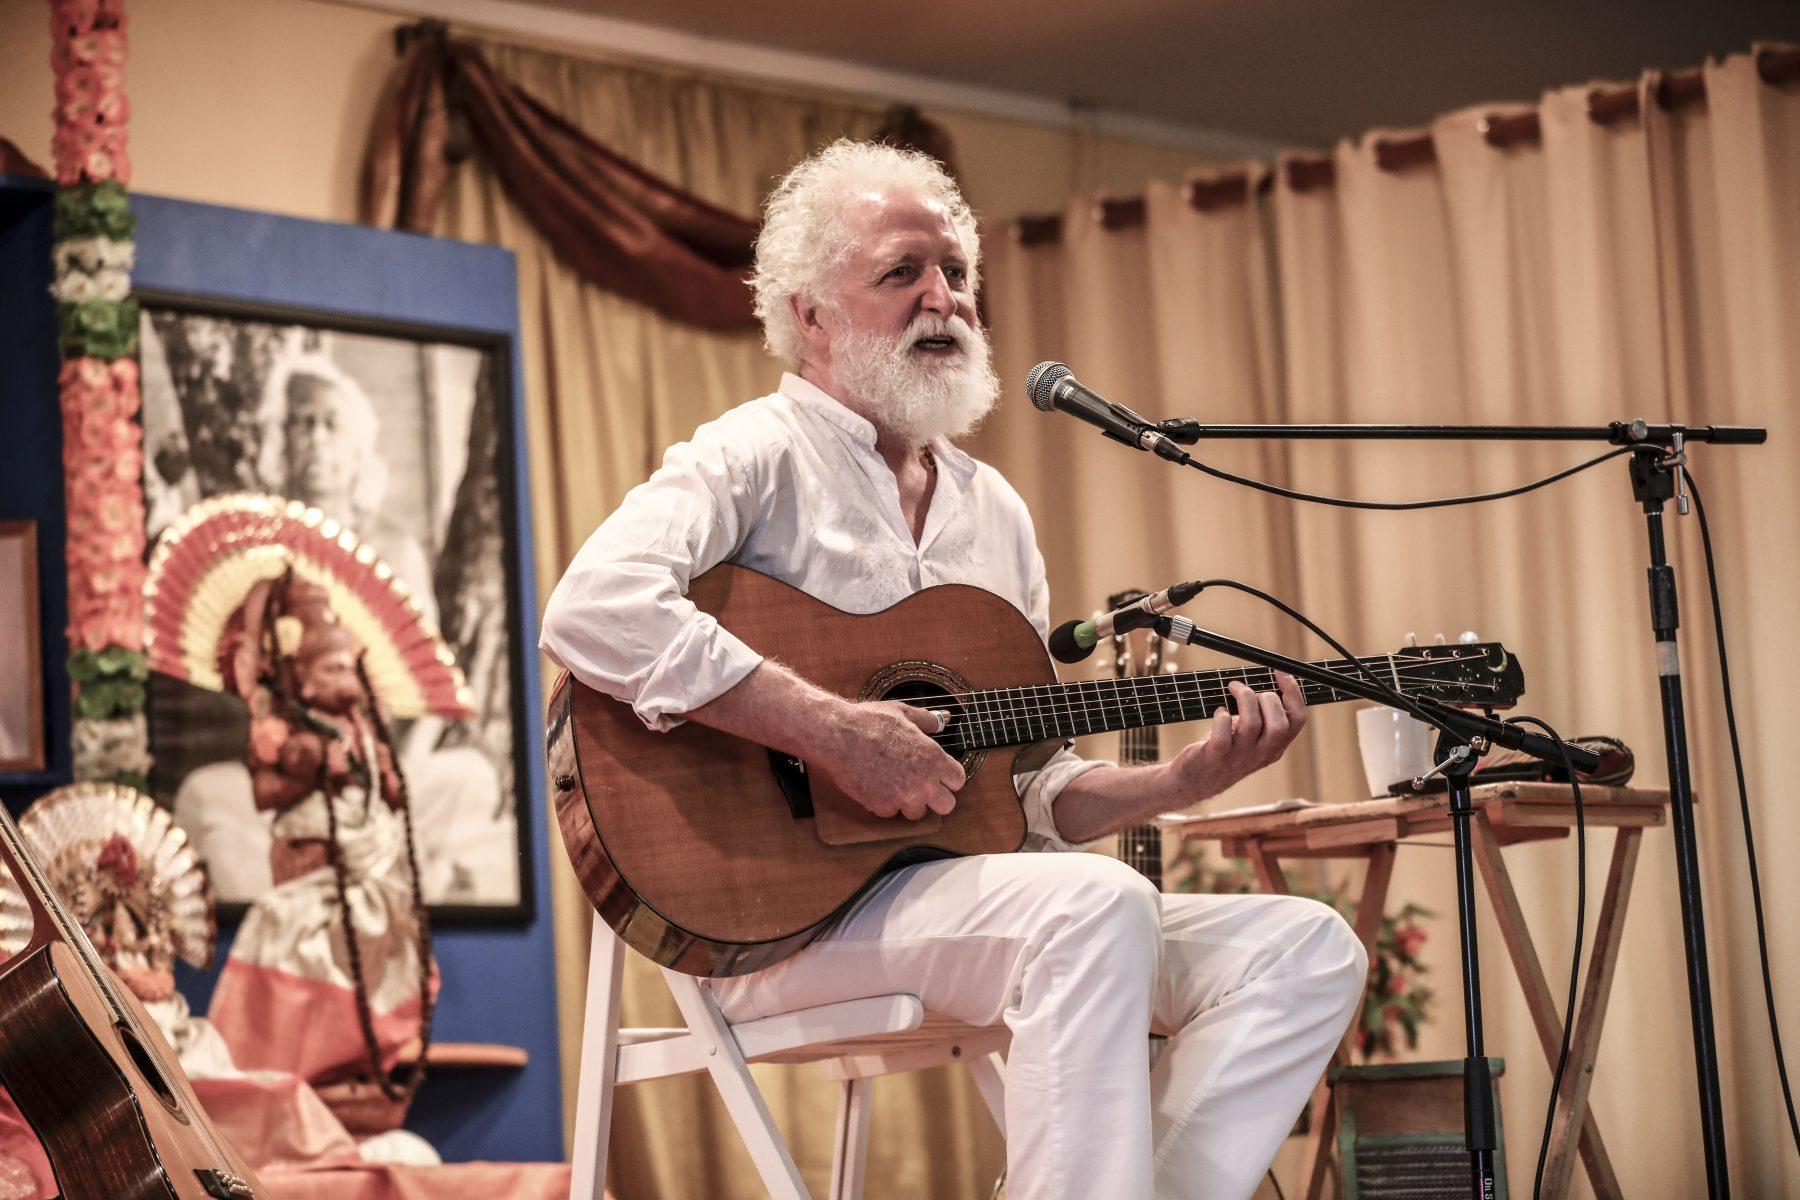 Sacred Sounds & Gospel Music at the Sivananda Yoga Ranch